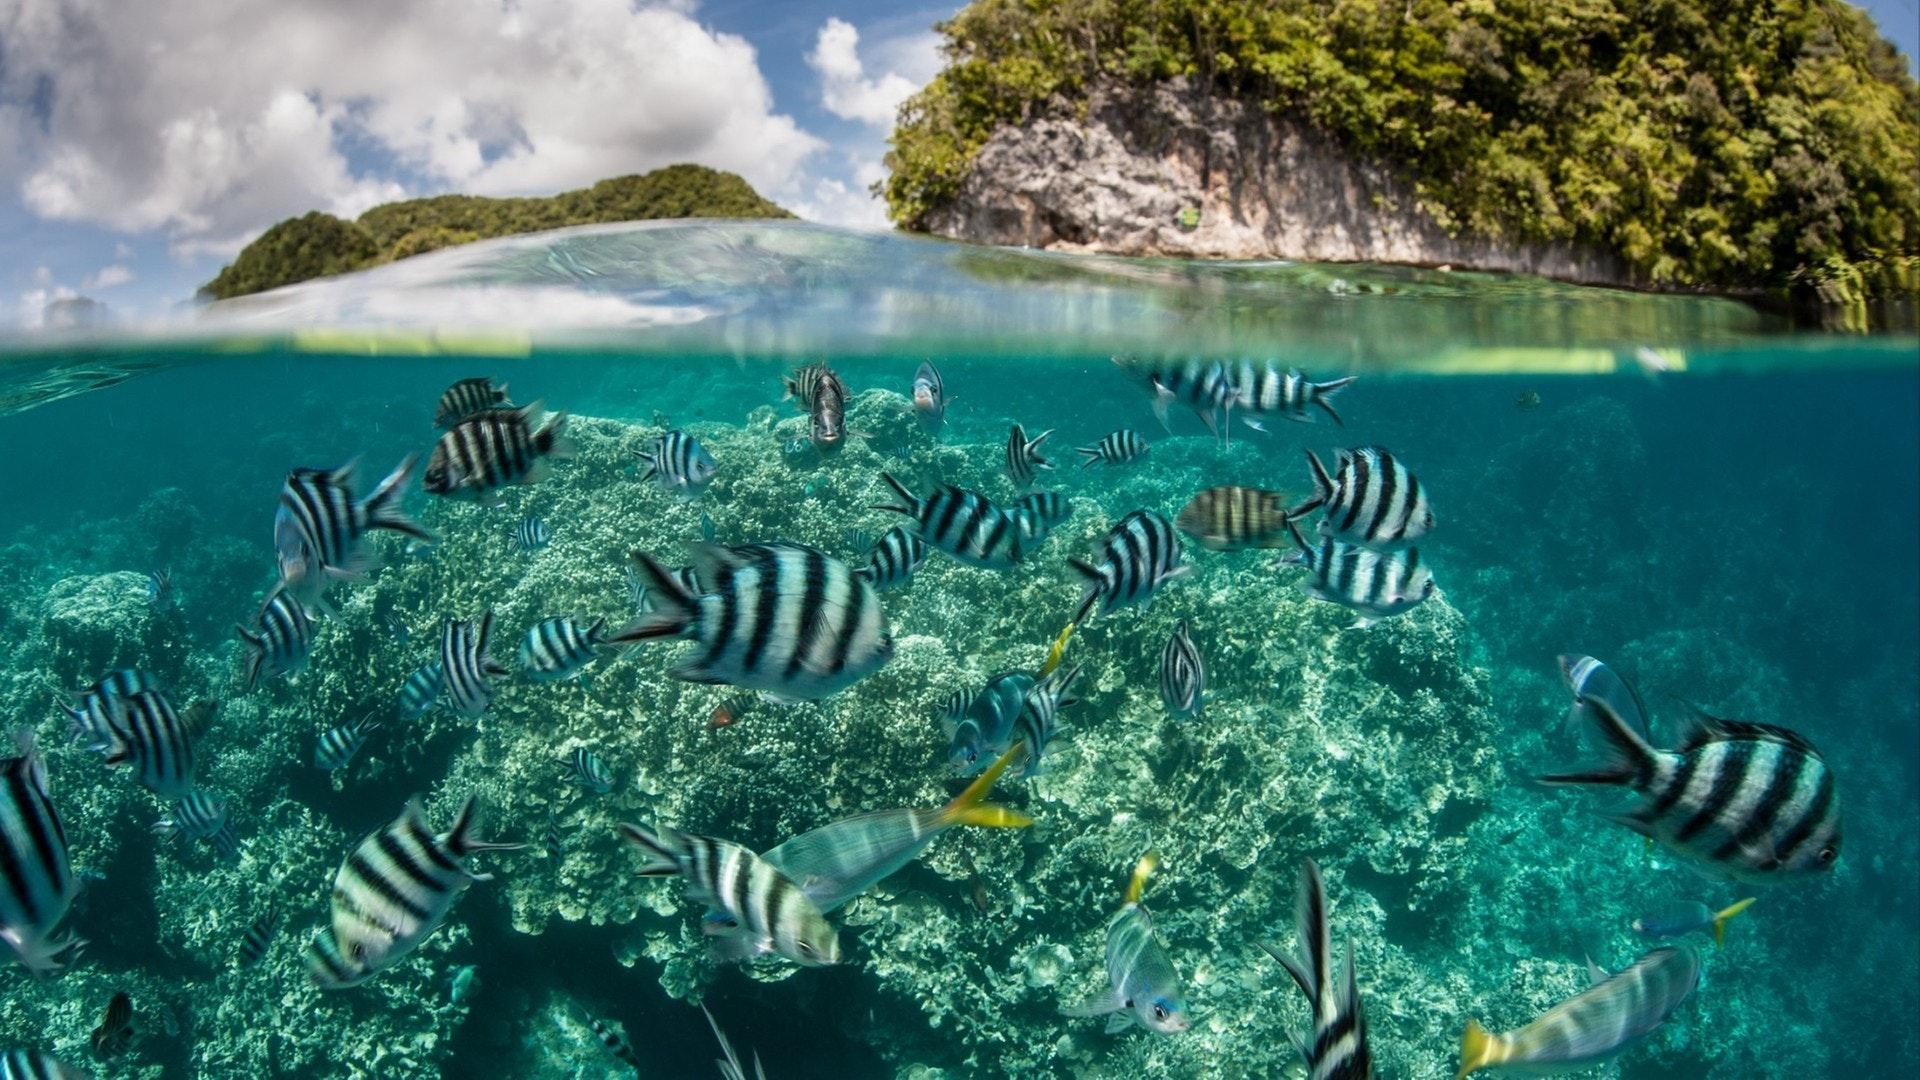 Damselfish swim in shallow water in Palau's inner lagoon